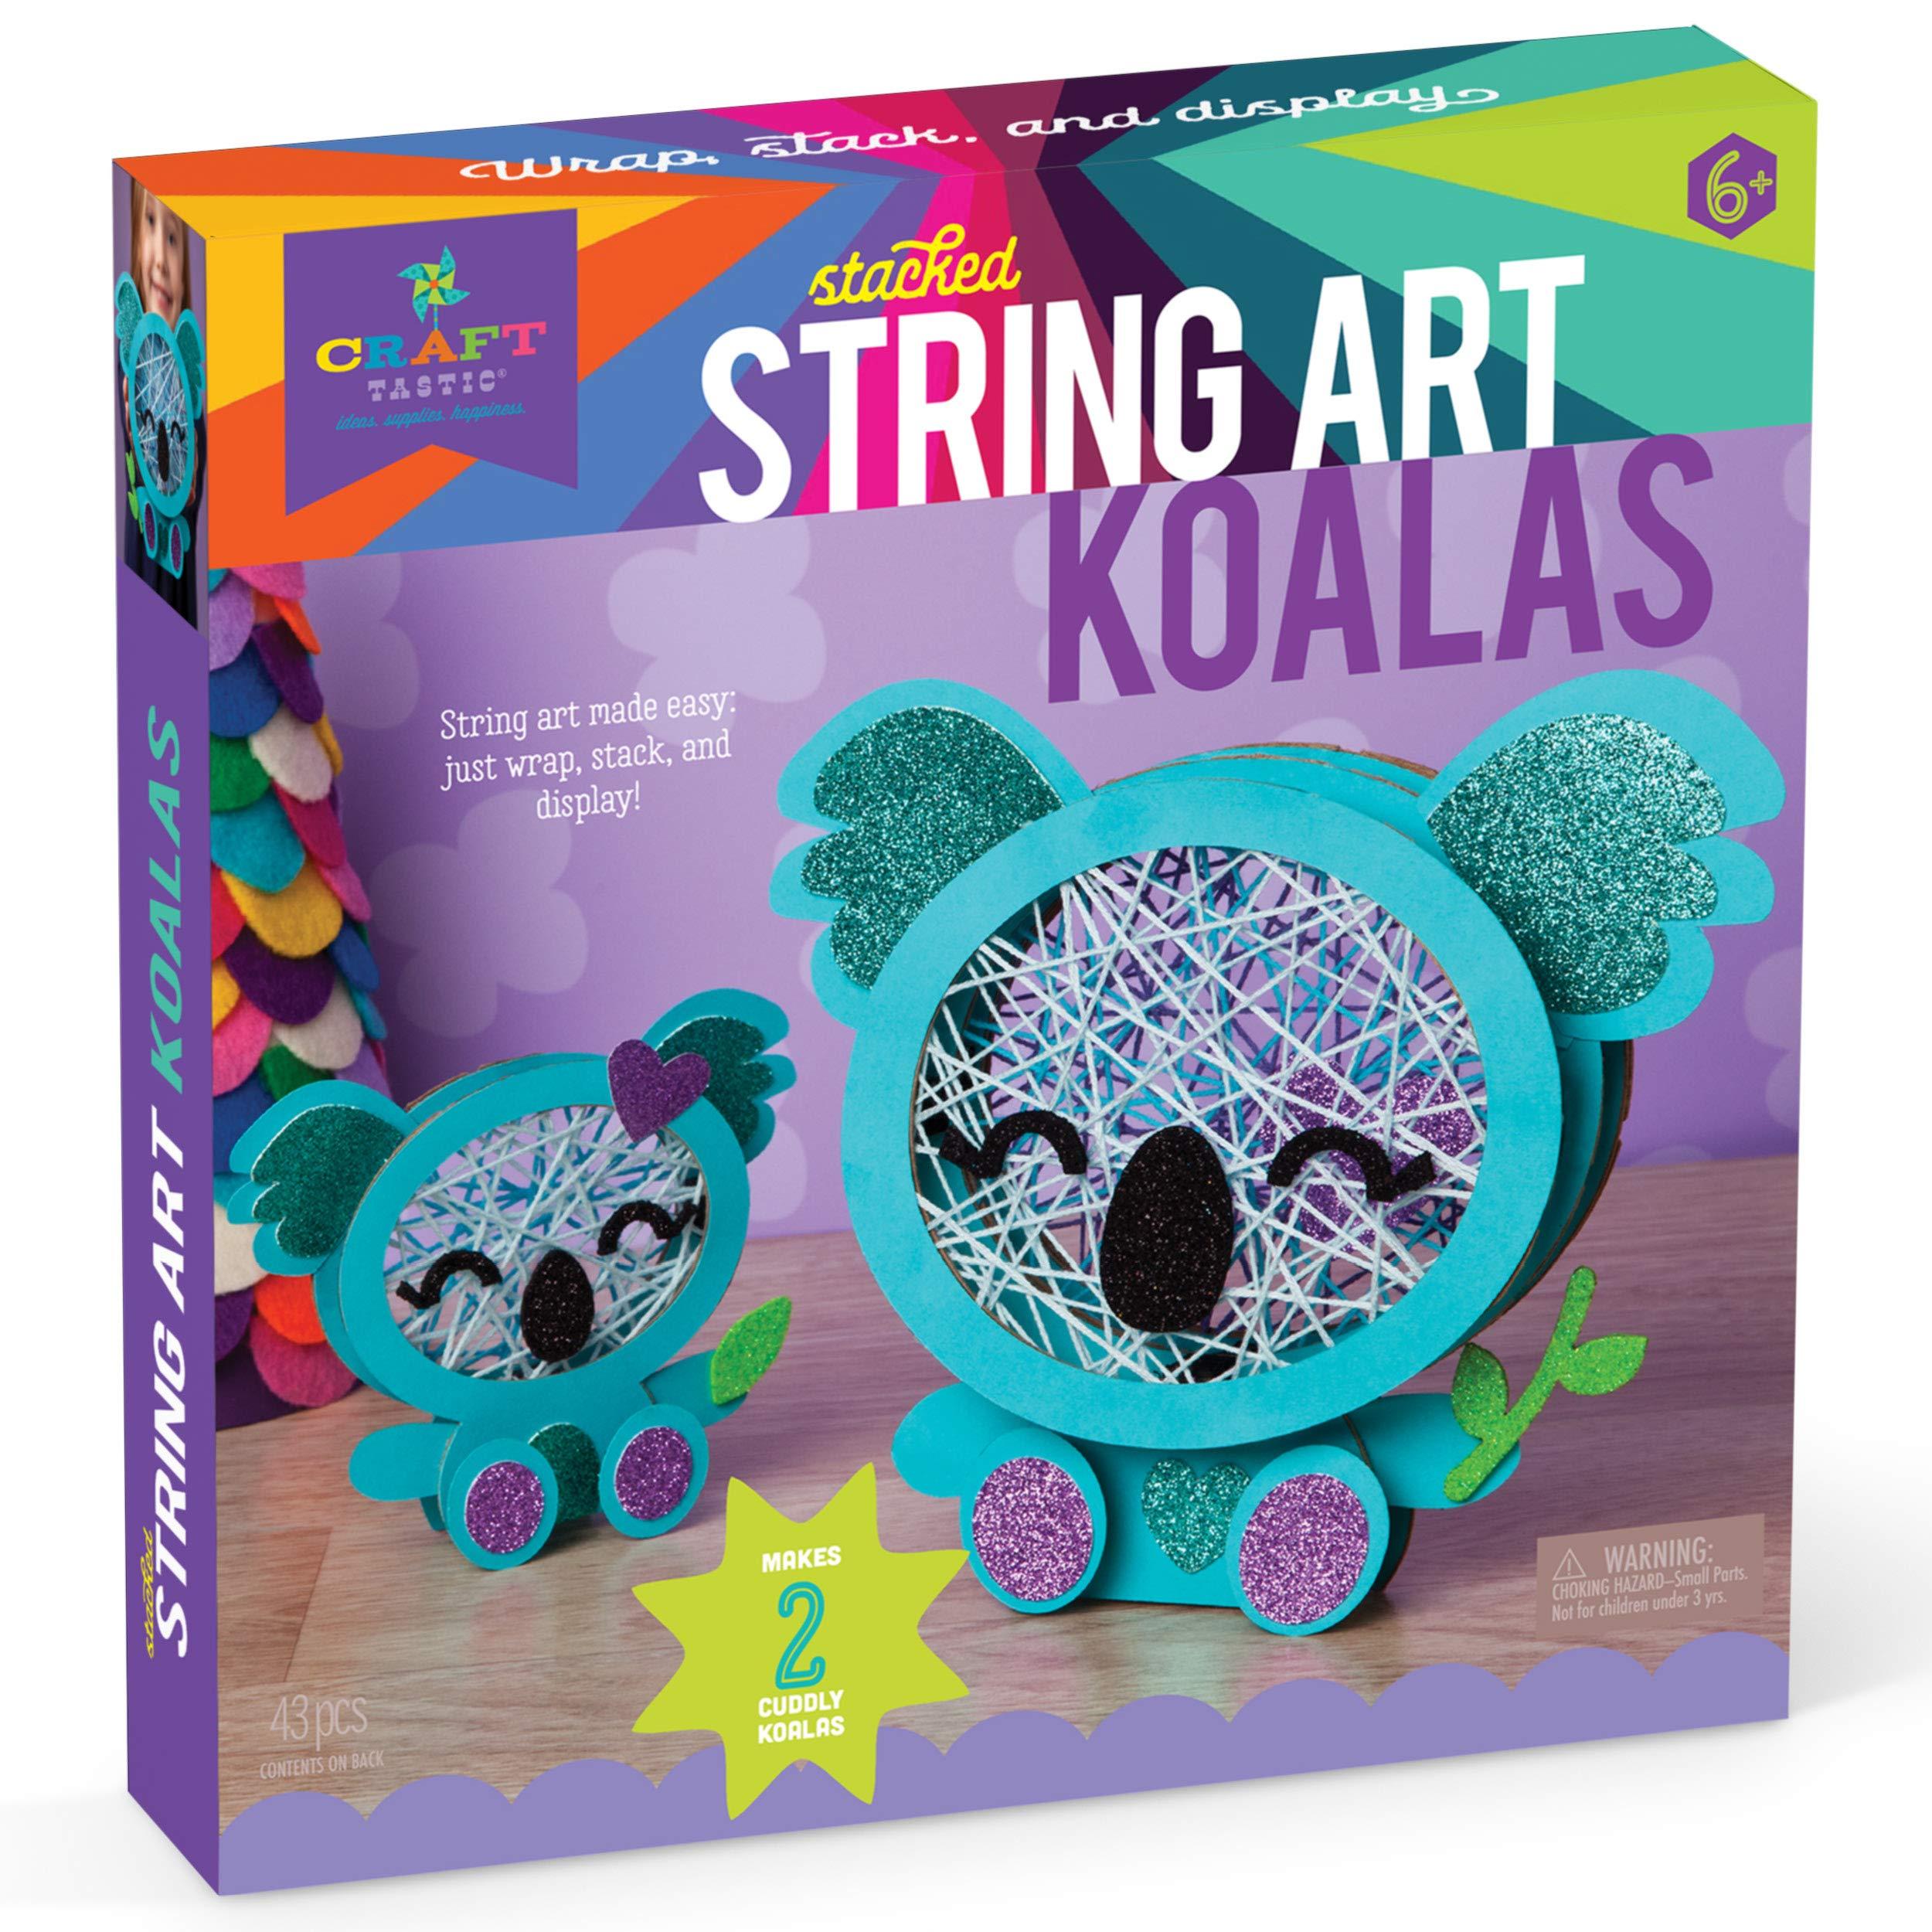 Craft-tastic – Stacked String Art Koalas  – Craft Kit Makes 2 Cute Koalas